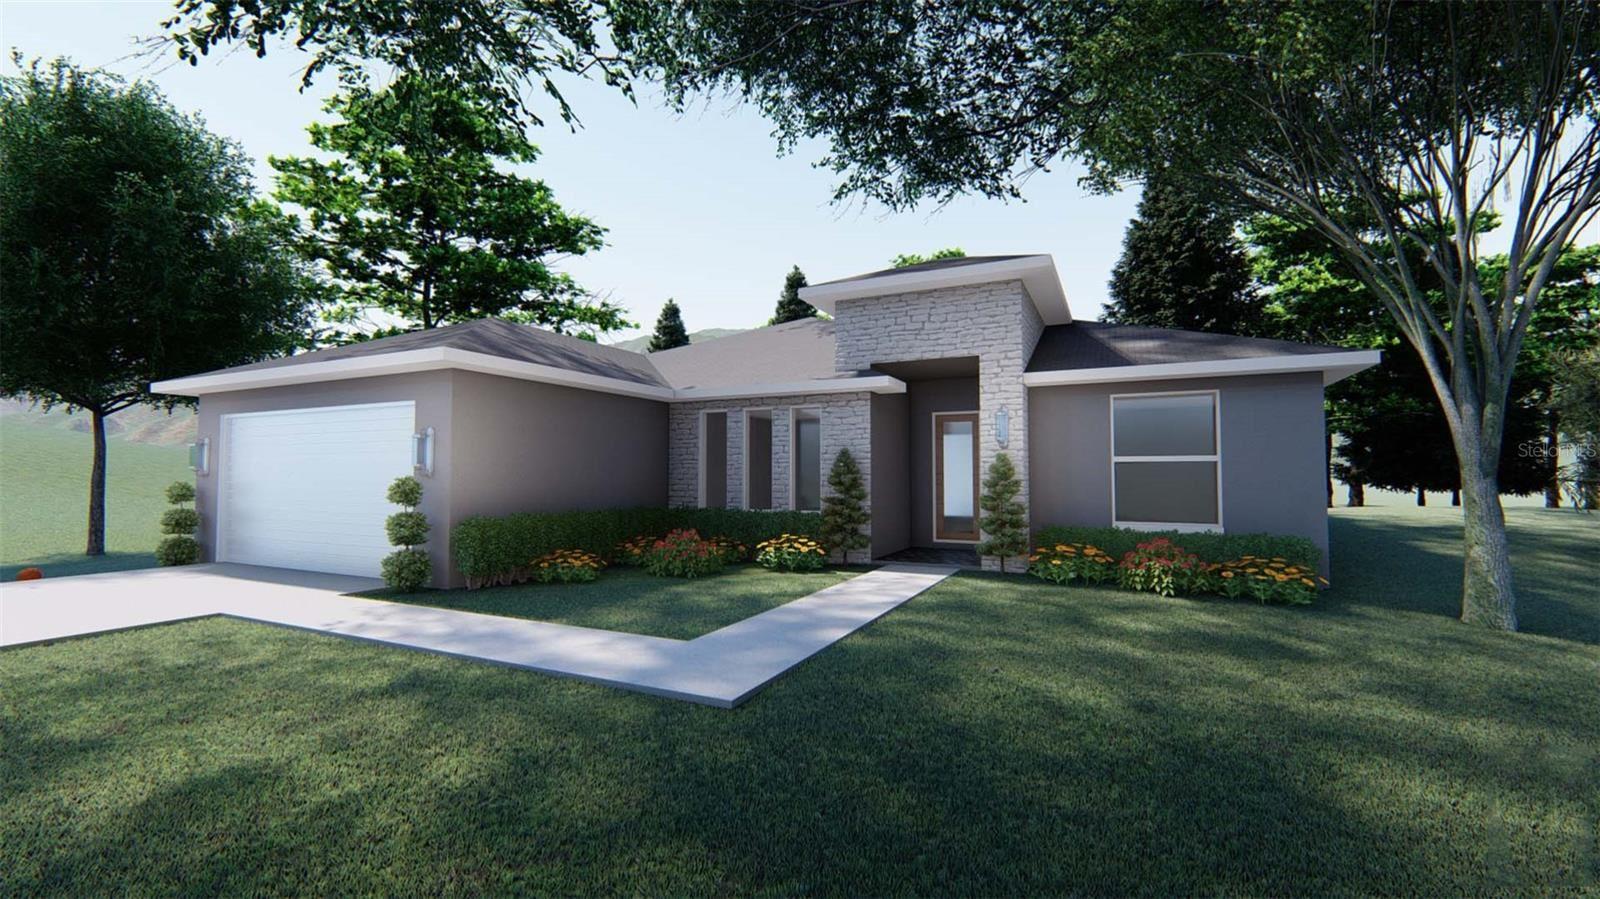 Lot 21 ODHAM STREET, Orlando, FL 32833 - #: O5978161